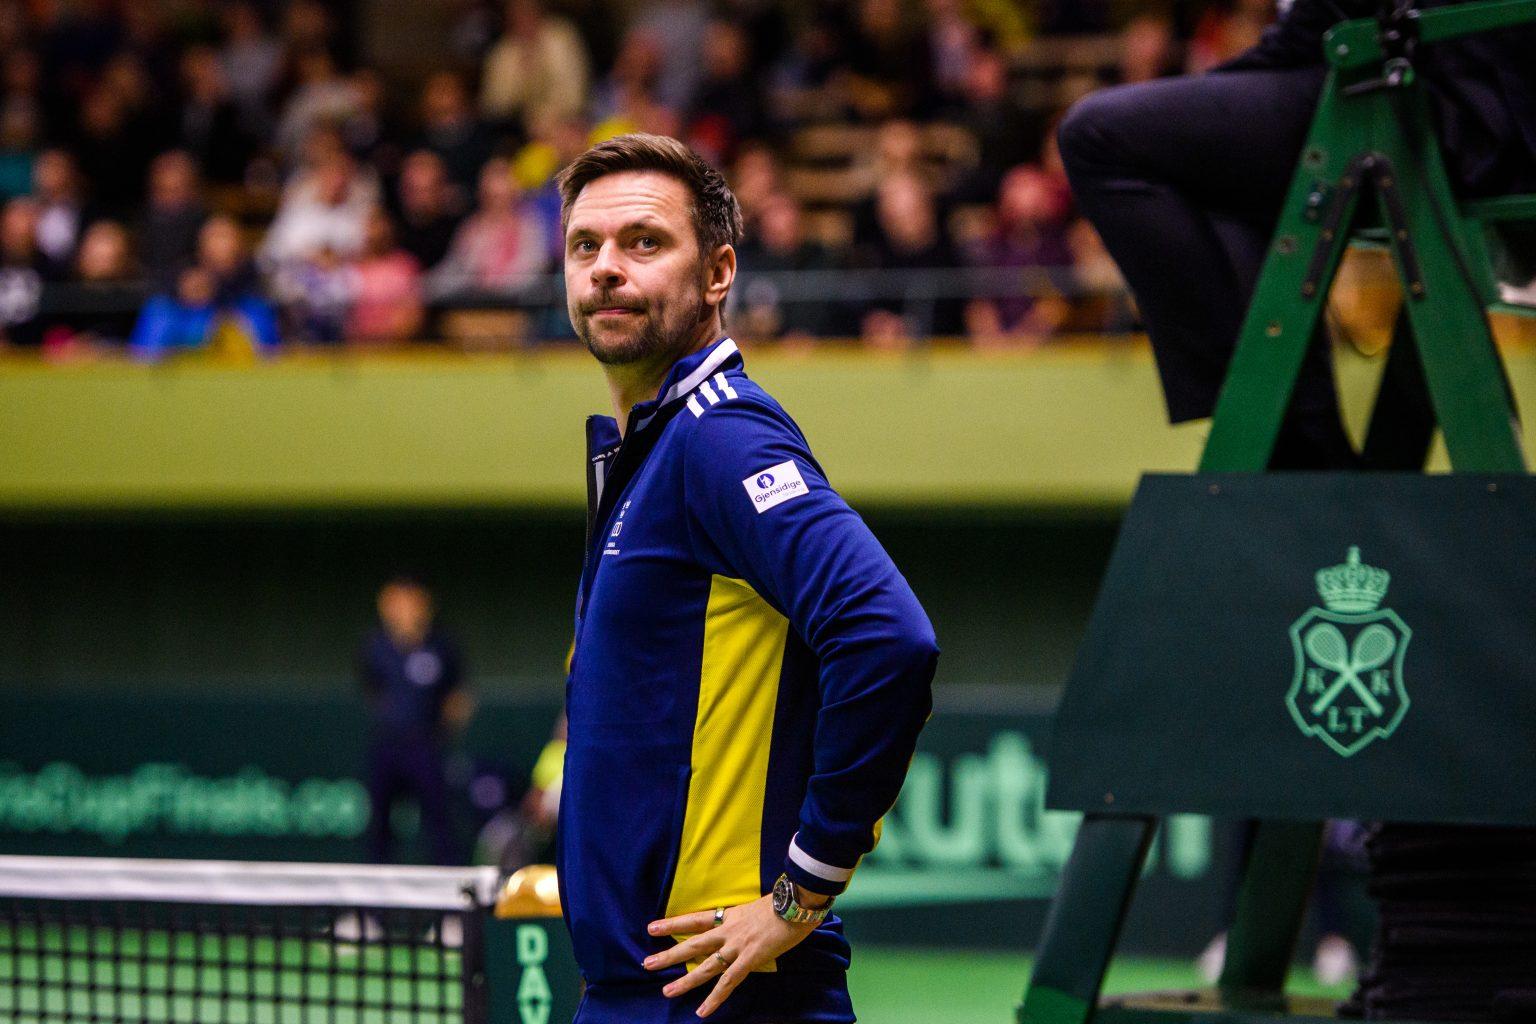 Davis Cup 2021 Live